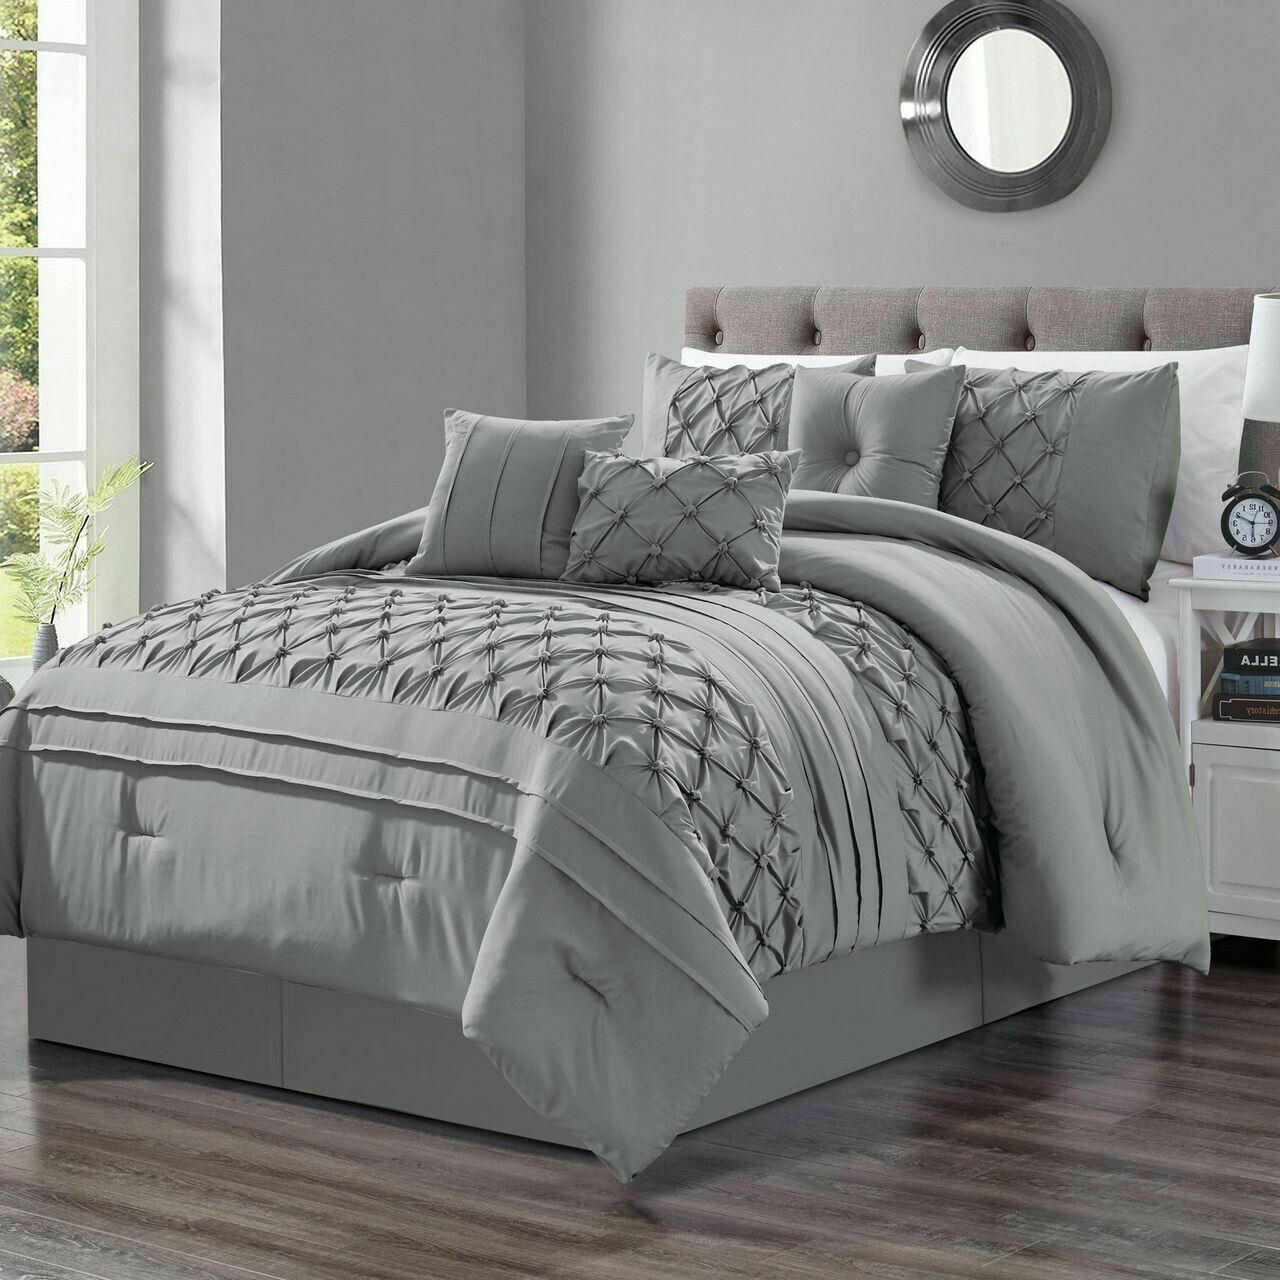 Elegant grau Embroiderot Pleat Pinch 7 pcs Cal King Queen Comforter Set